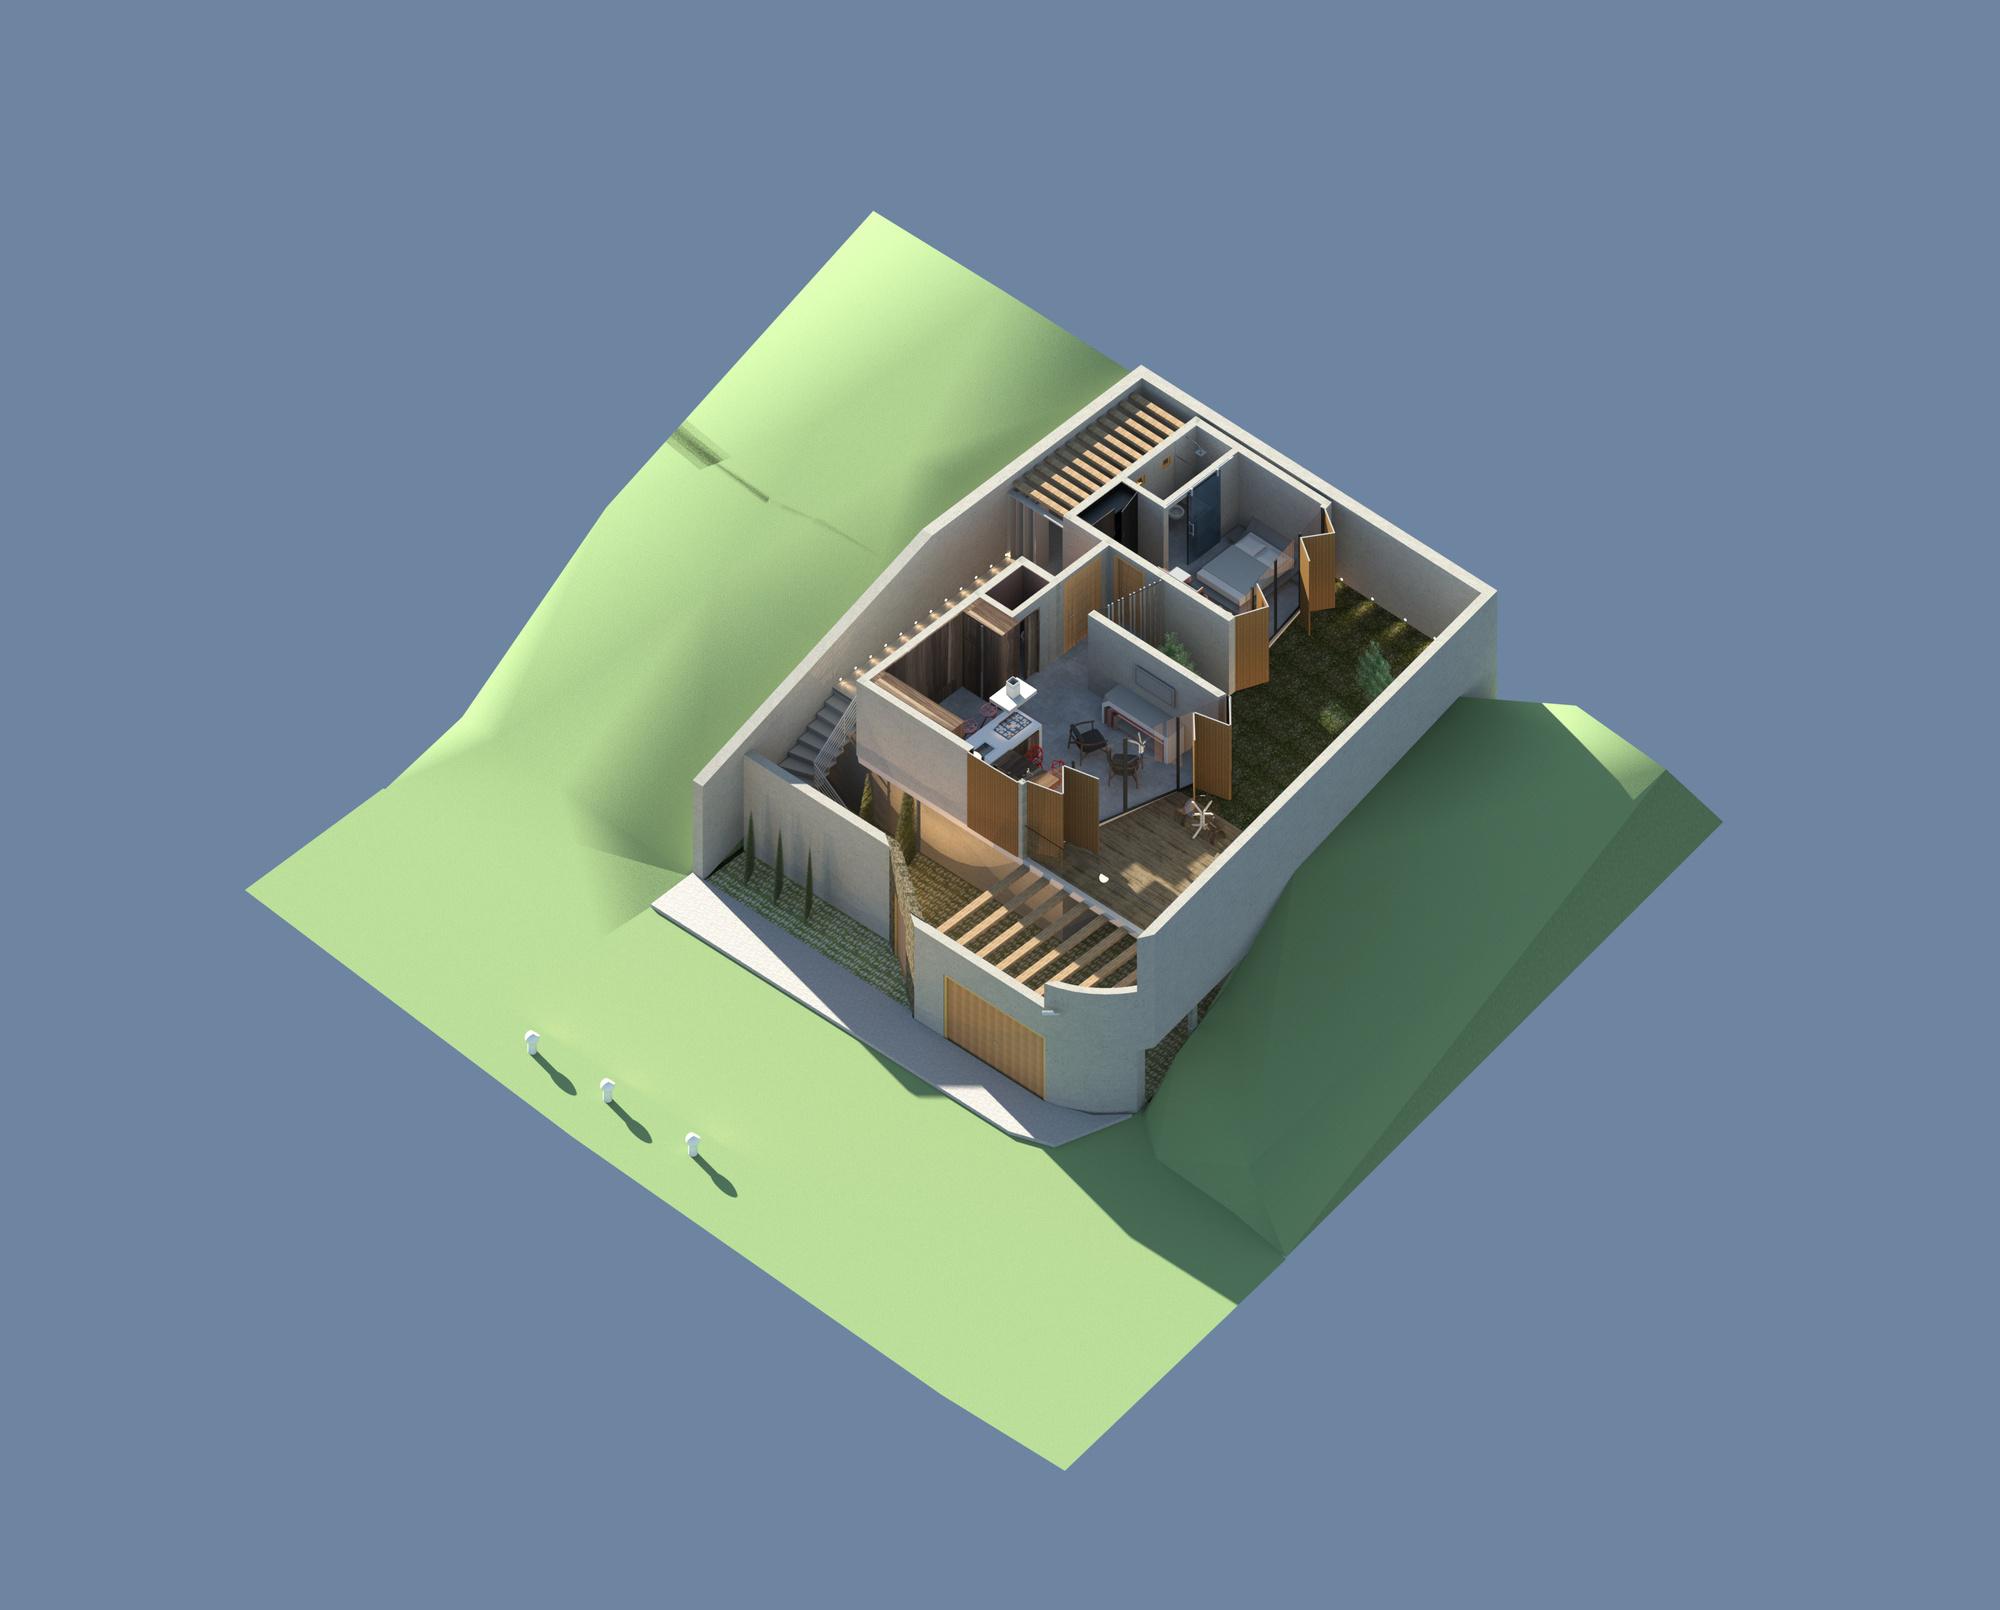 Raas-rendering20150603-6111-132pzmz